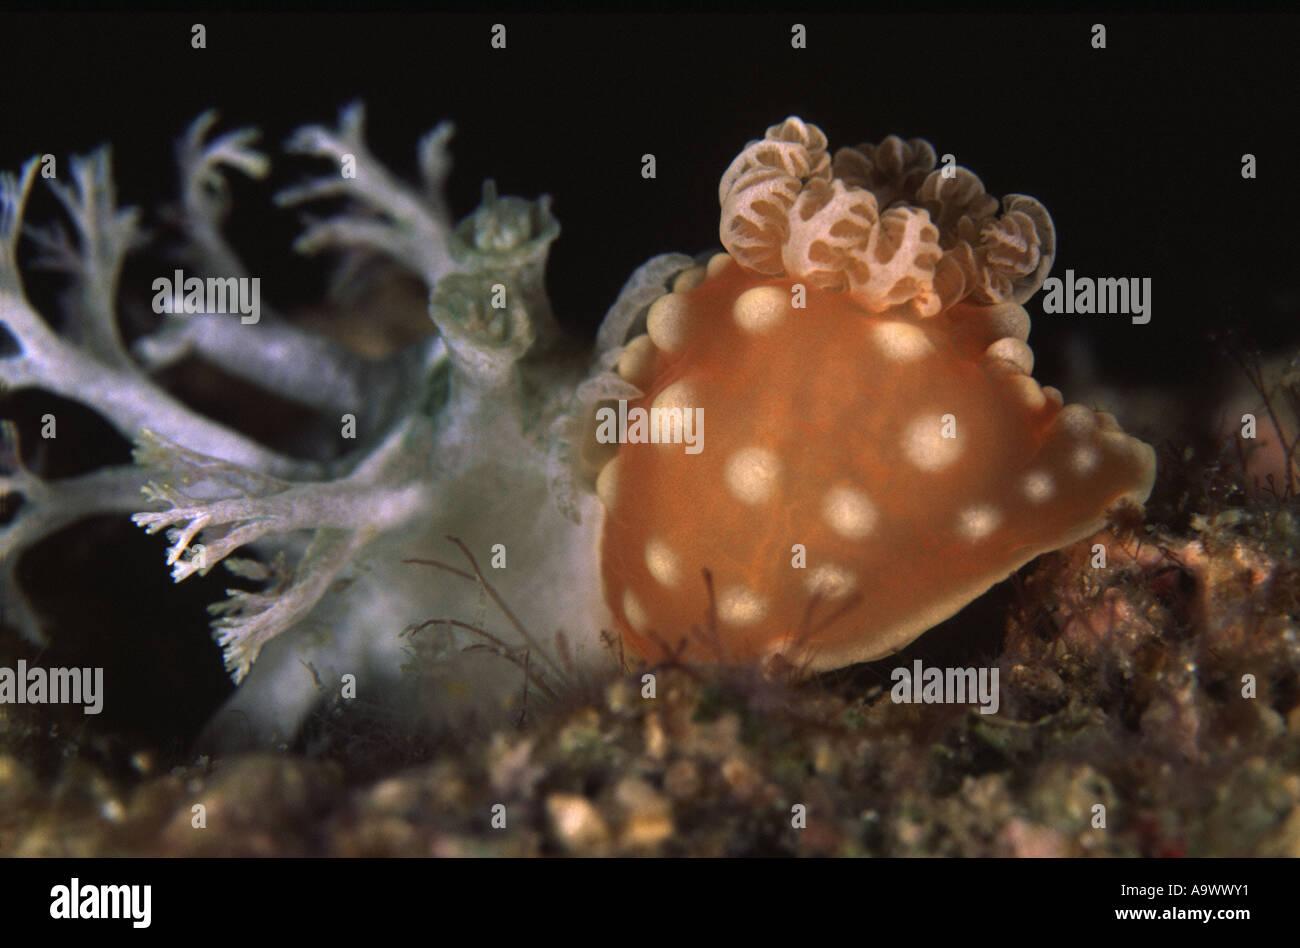 Marionia sp. Feeding on Gymnodoris sp. - Stock Image